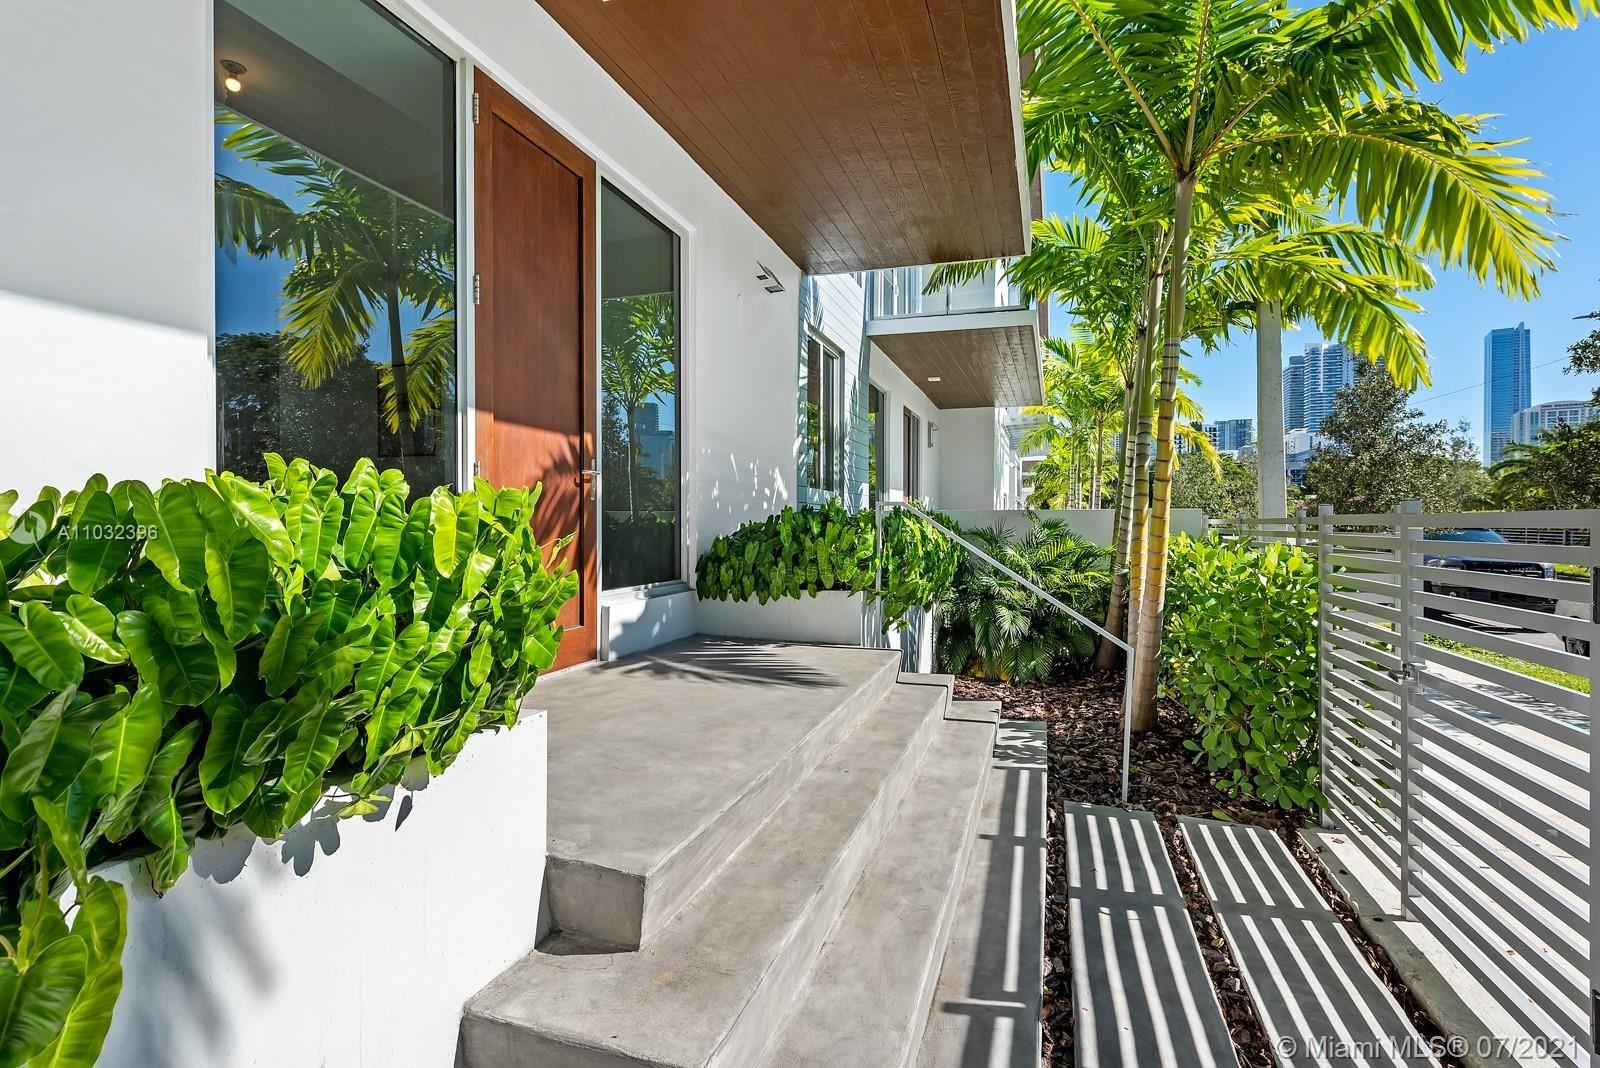 545 SW 11TH STREET #106, Miami, FL 33129 - #: A11032396